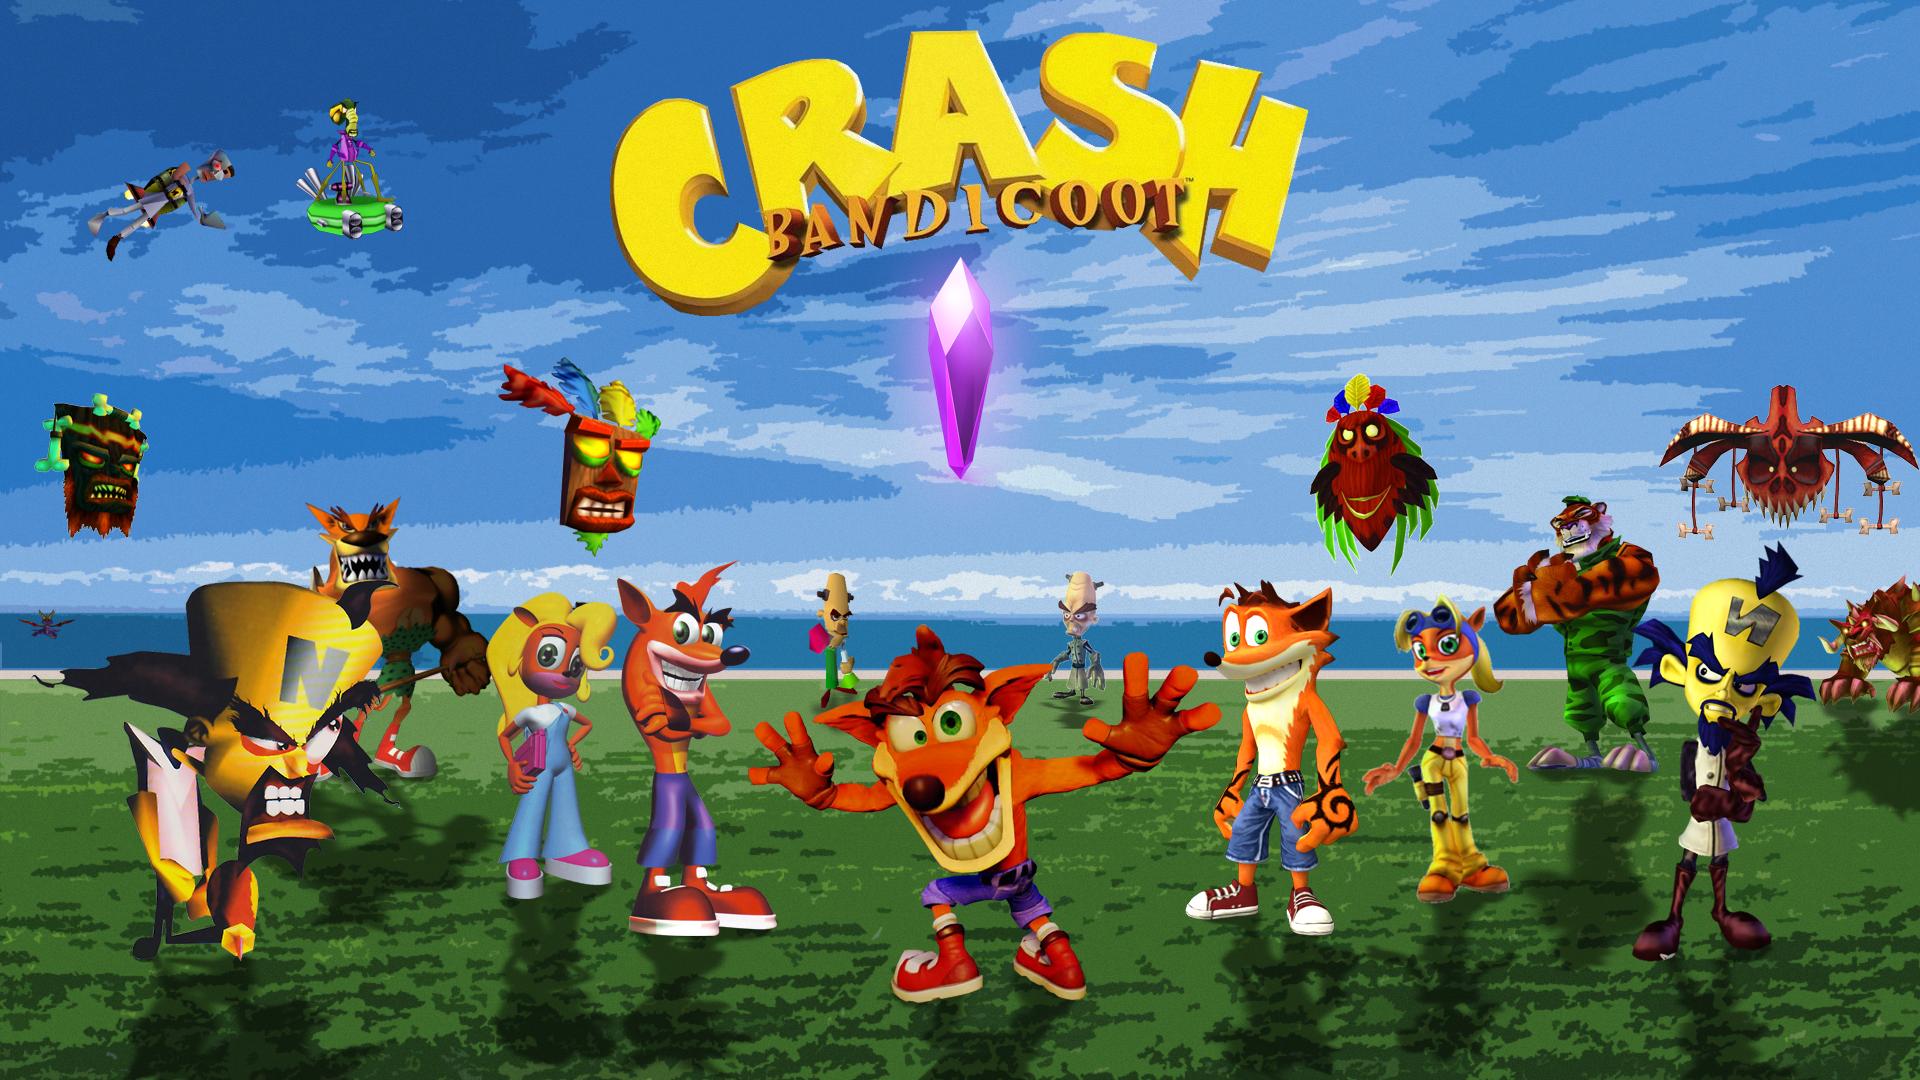 Crash Bandicoot Background   Imgur 1920x1080